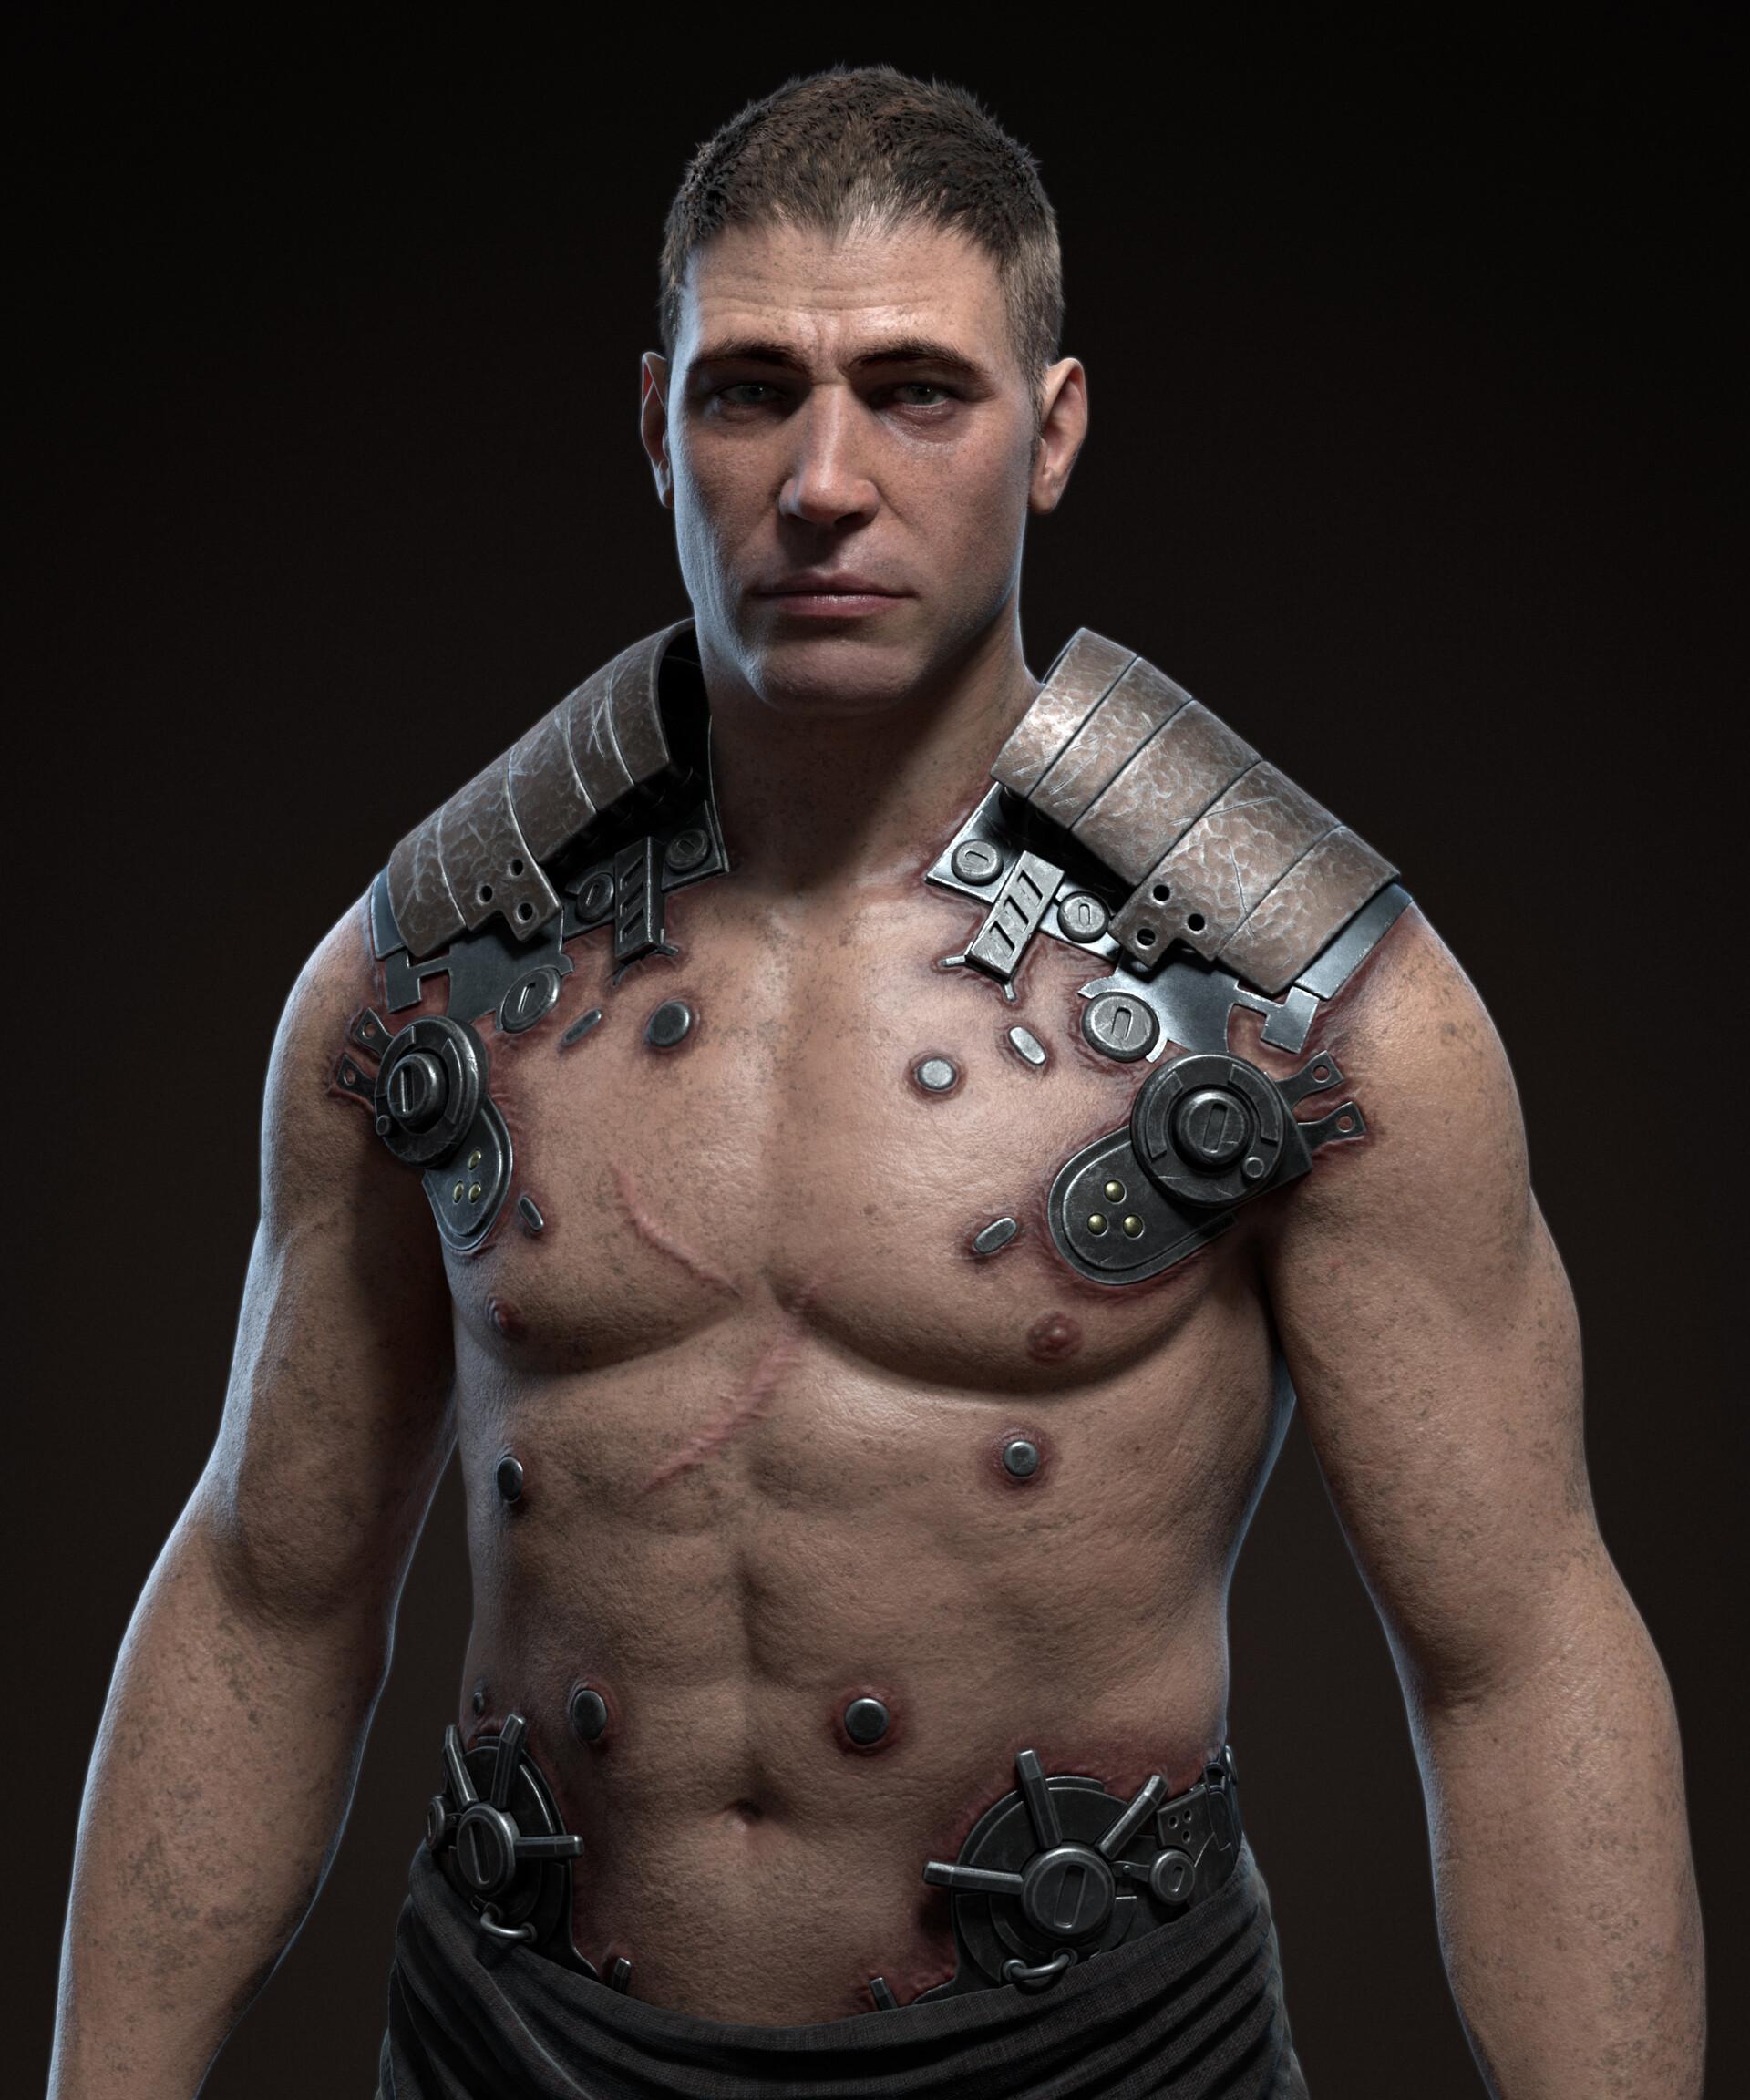 Alec hunstx mid anatomy nips